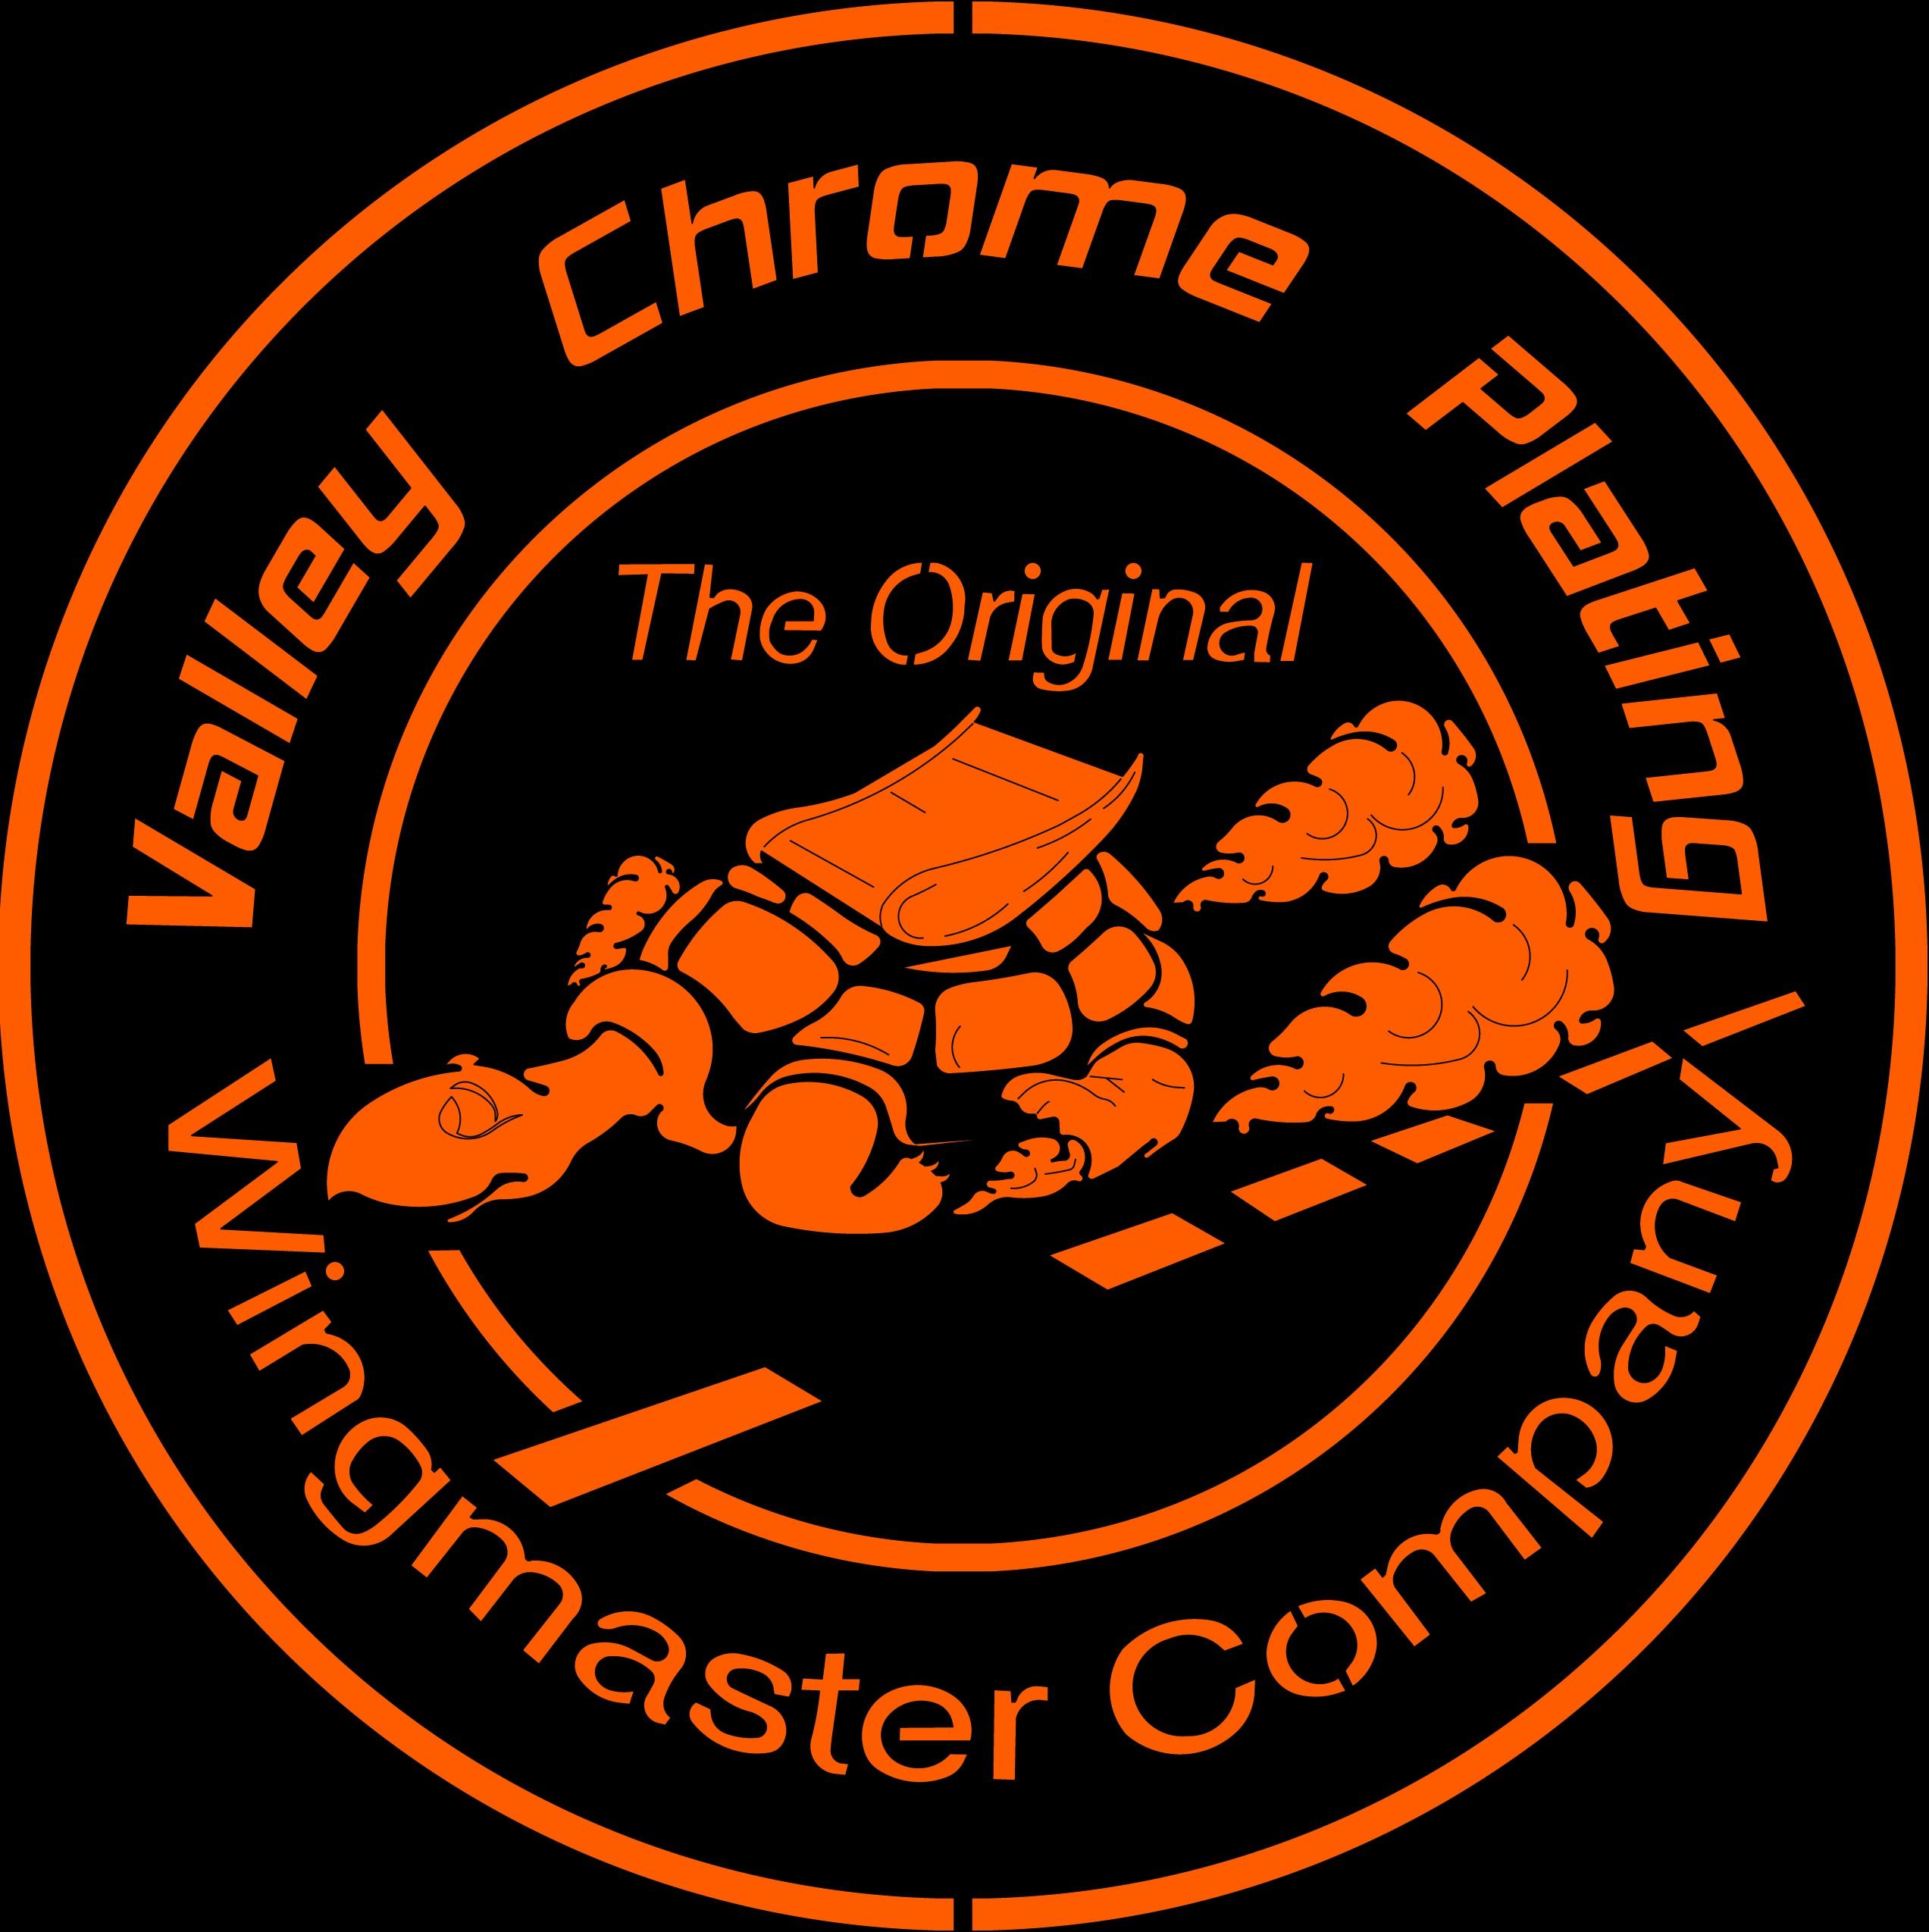 wingmaster-logo3.jpg